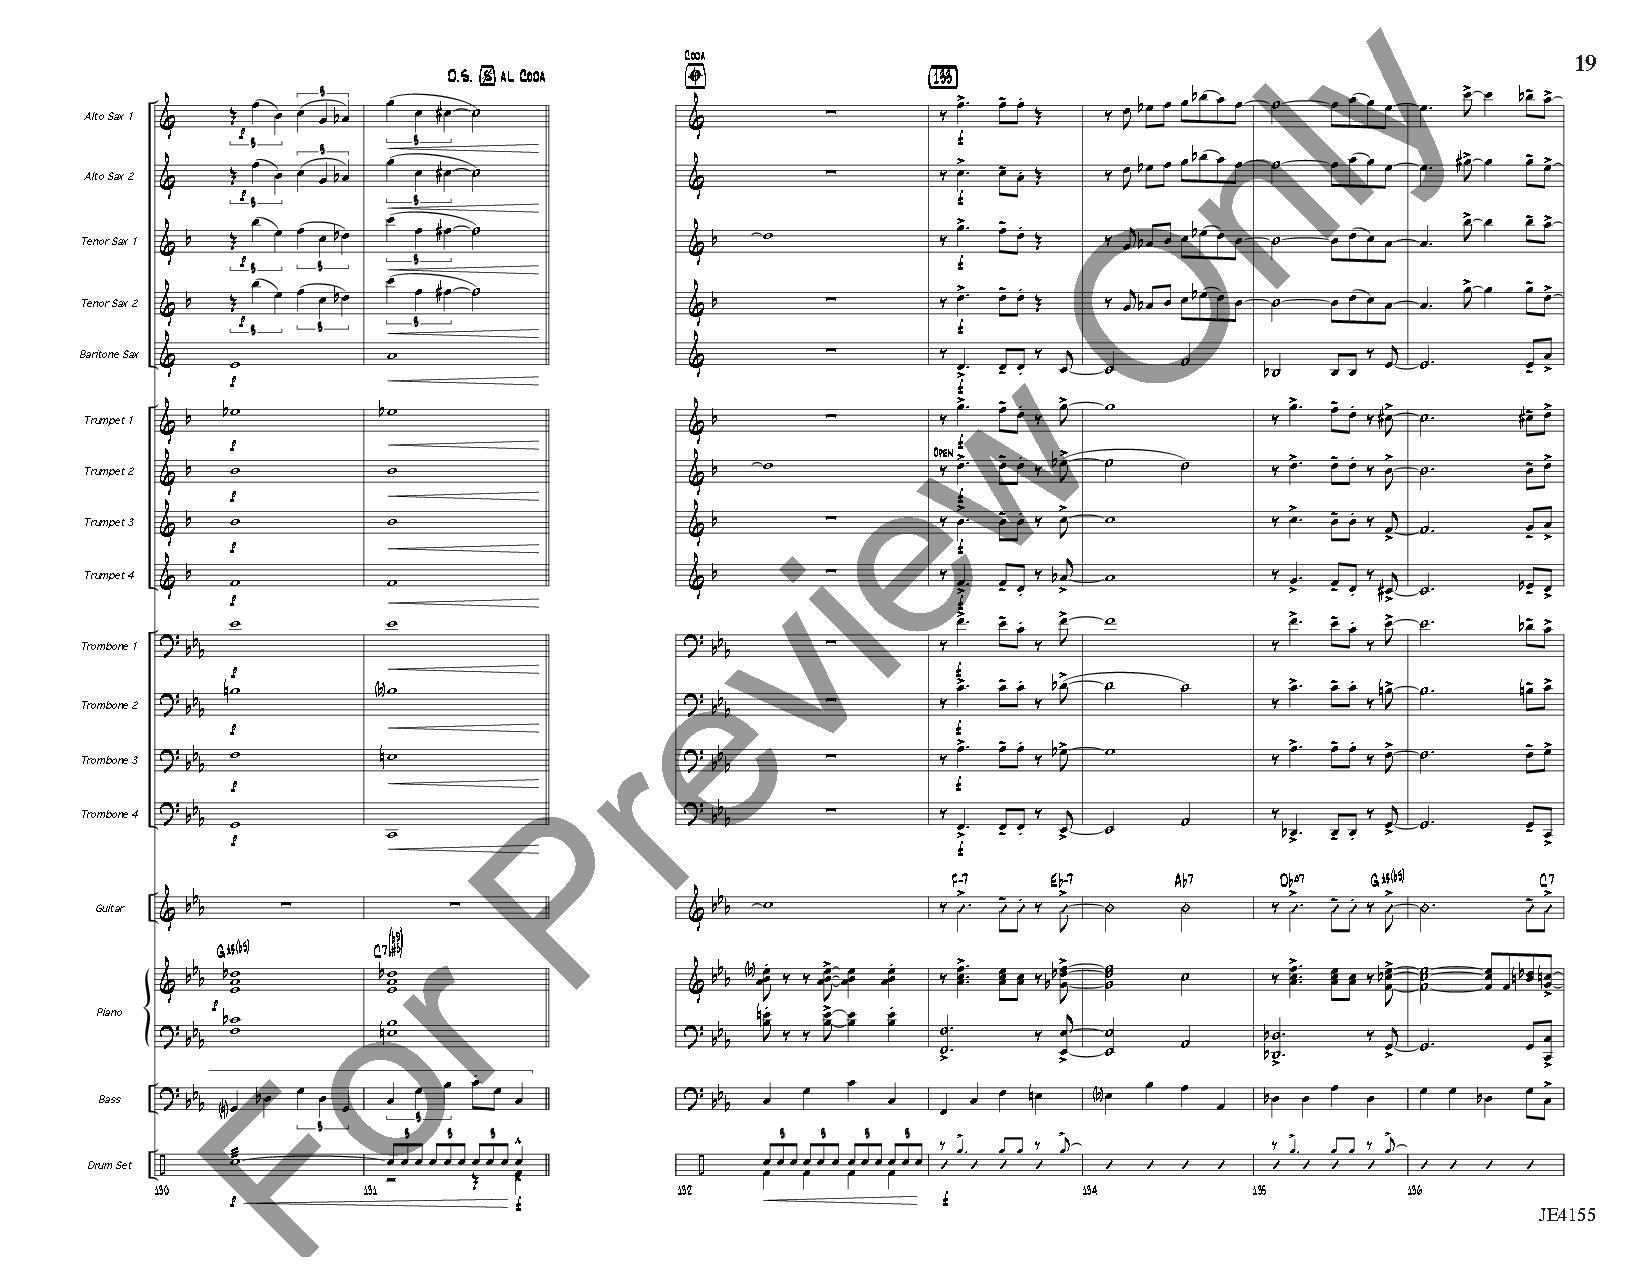 Blue Tiger by Erik Morales| J.W. Pepper Sheet Music